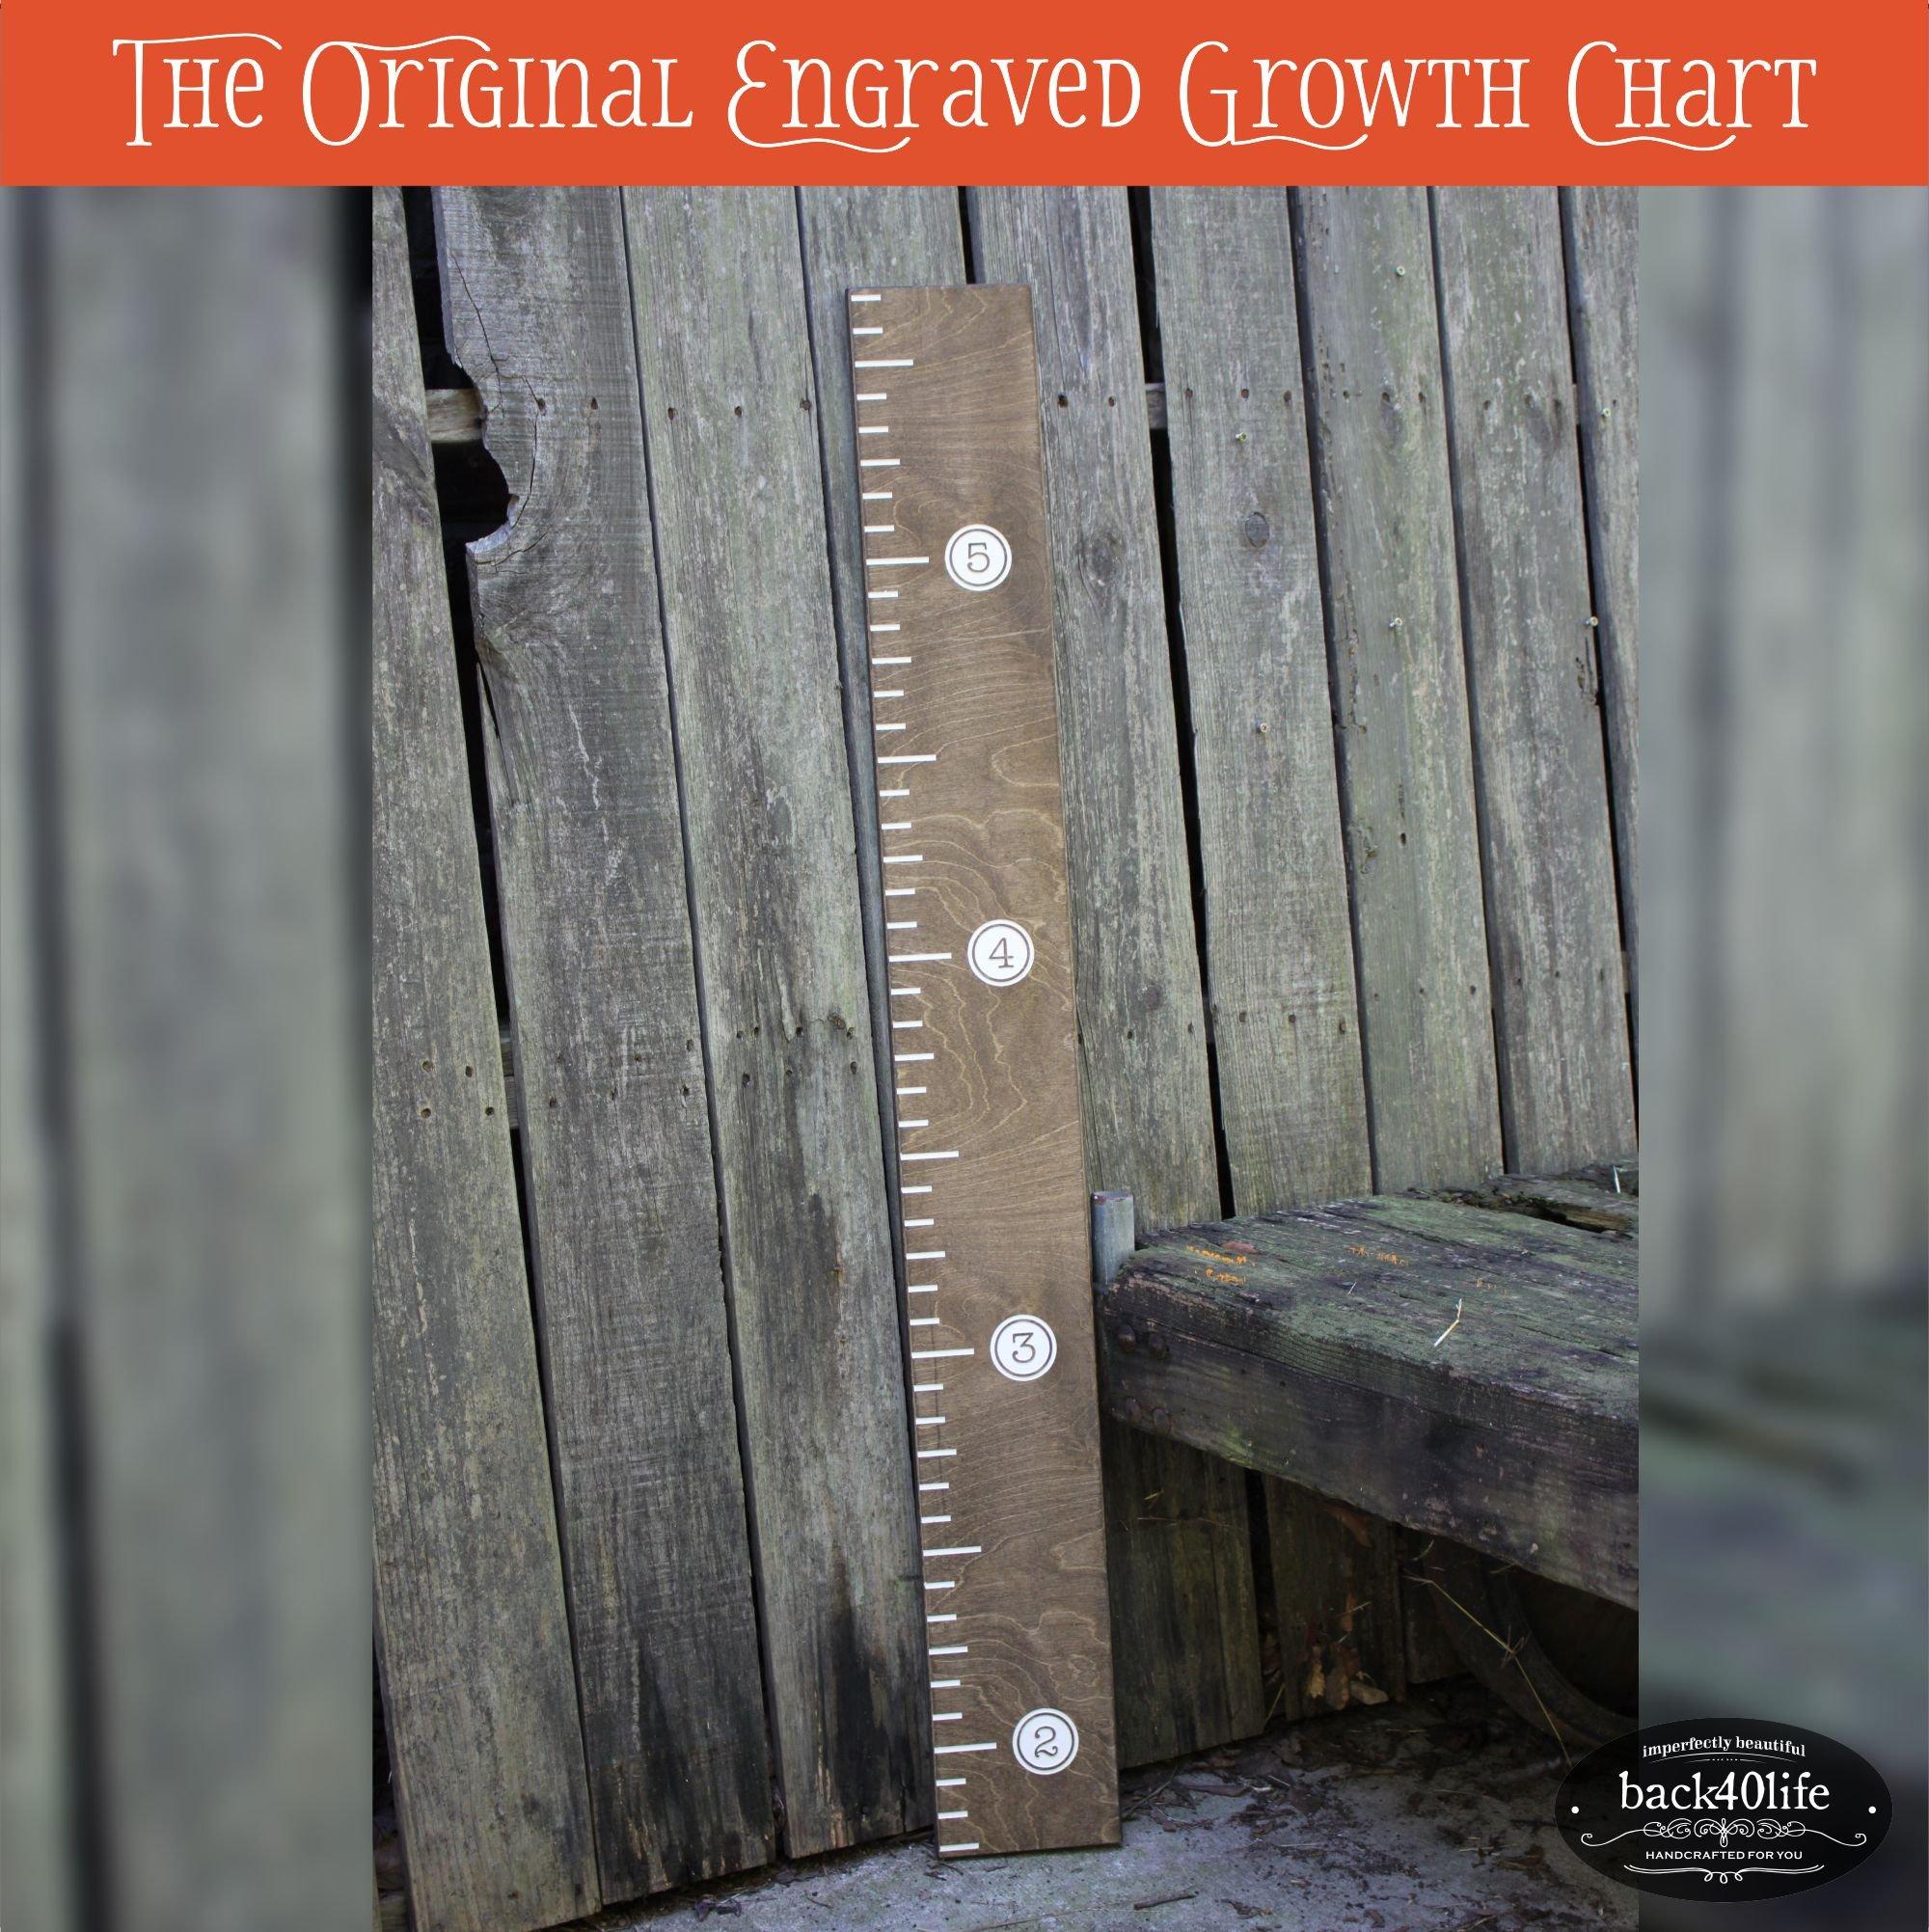 Back40Life 48'' Premium Engraved Wooden Growth Height Chart Ruler - The Typewriter (Dark Walnut + Antique White)